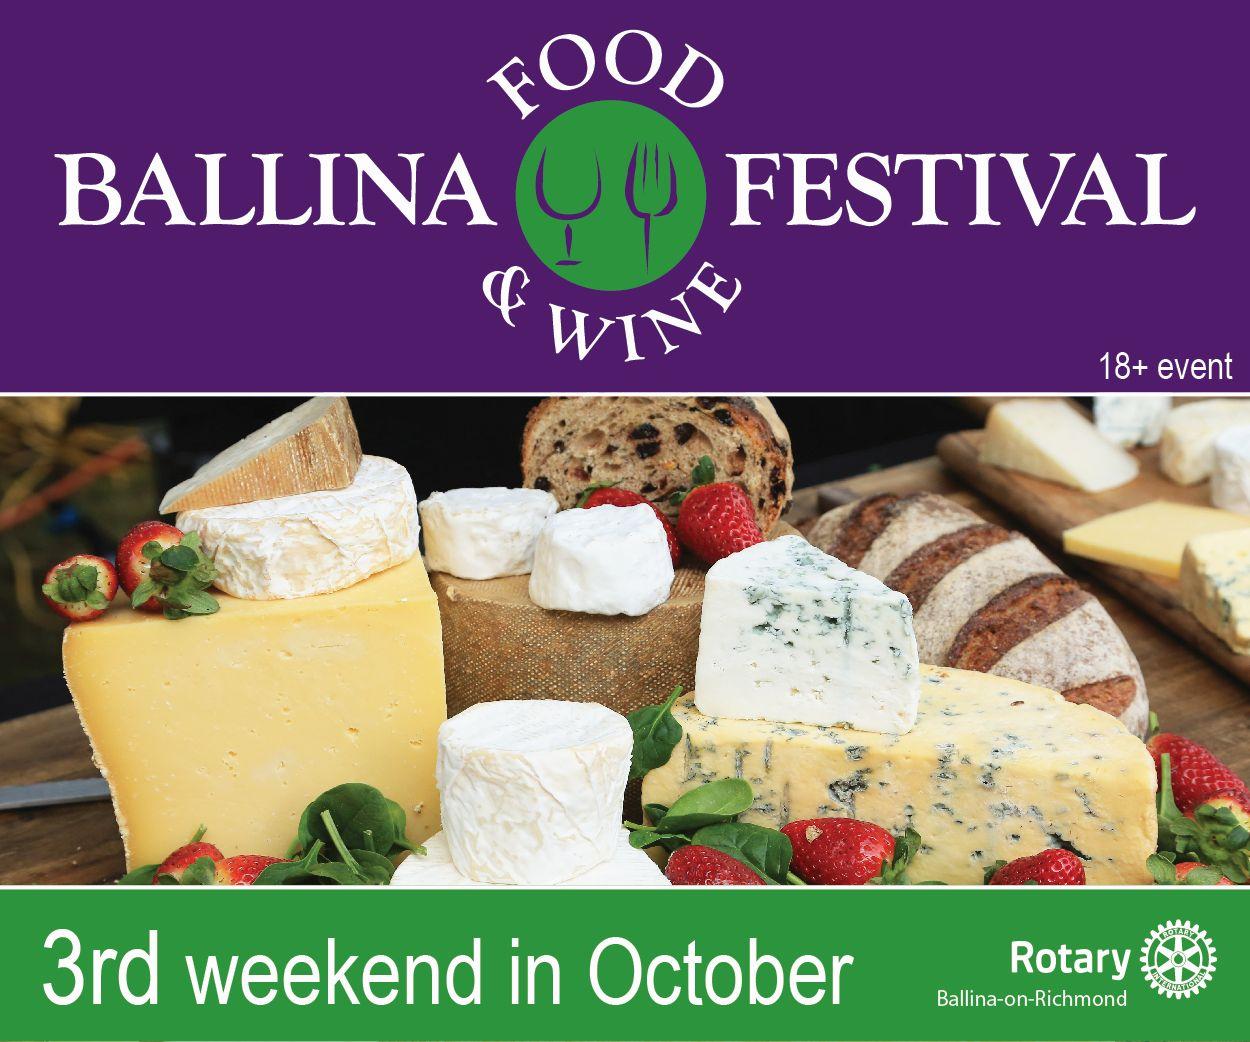 Ballina Food and Wine Festival